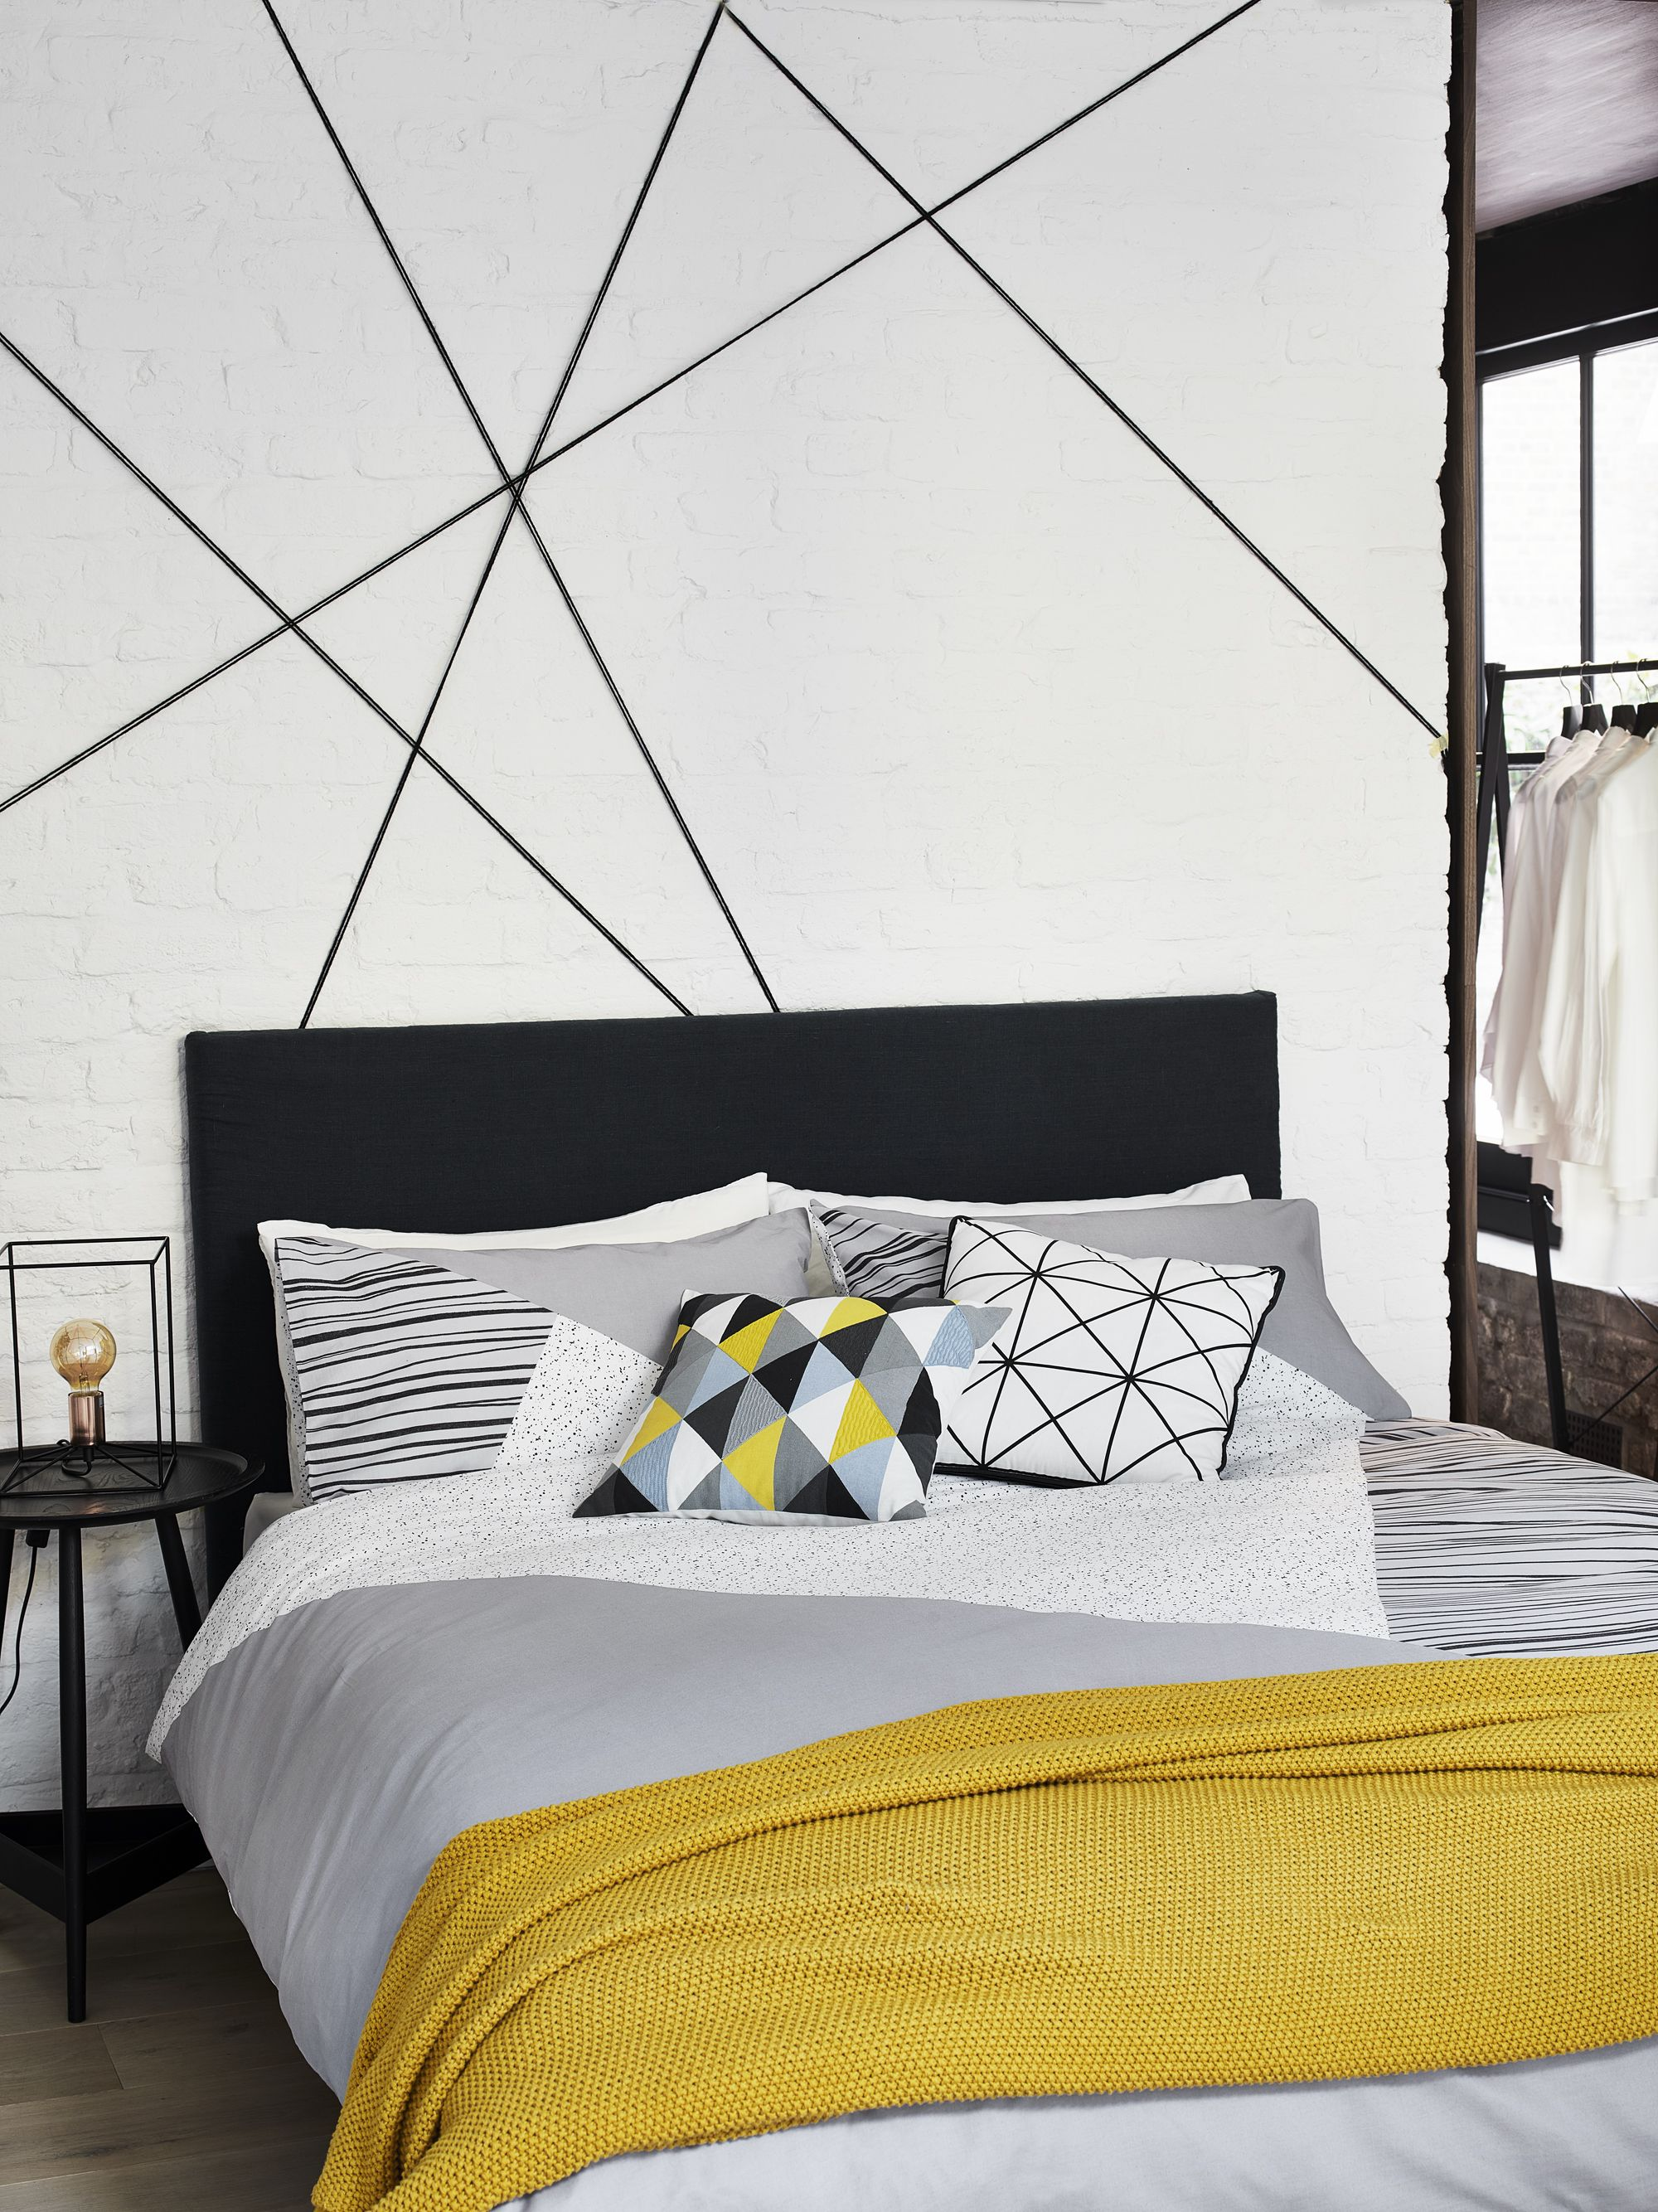 Best New Season Asda Bedding To Buy Asda George Bedding